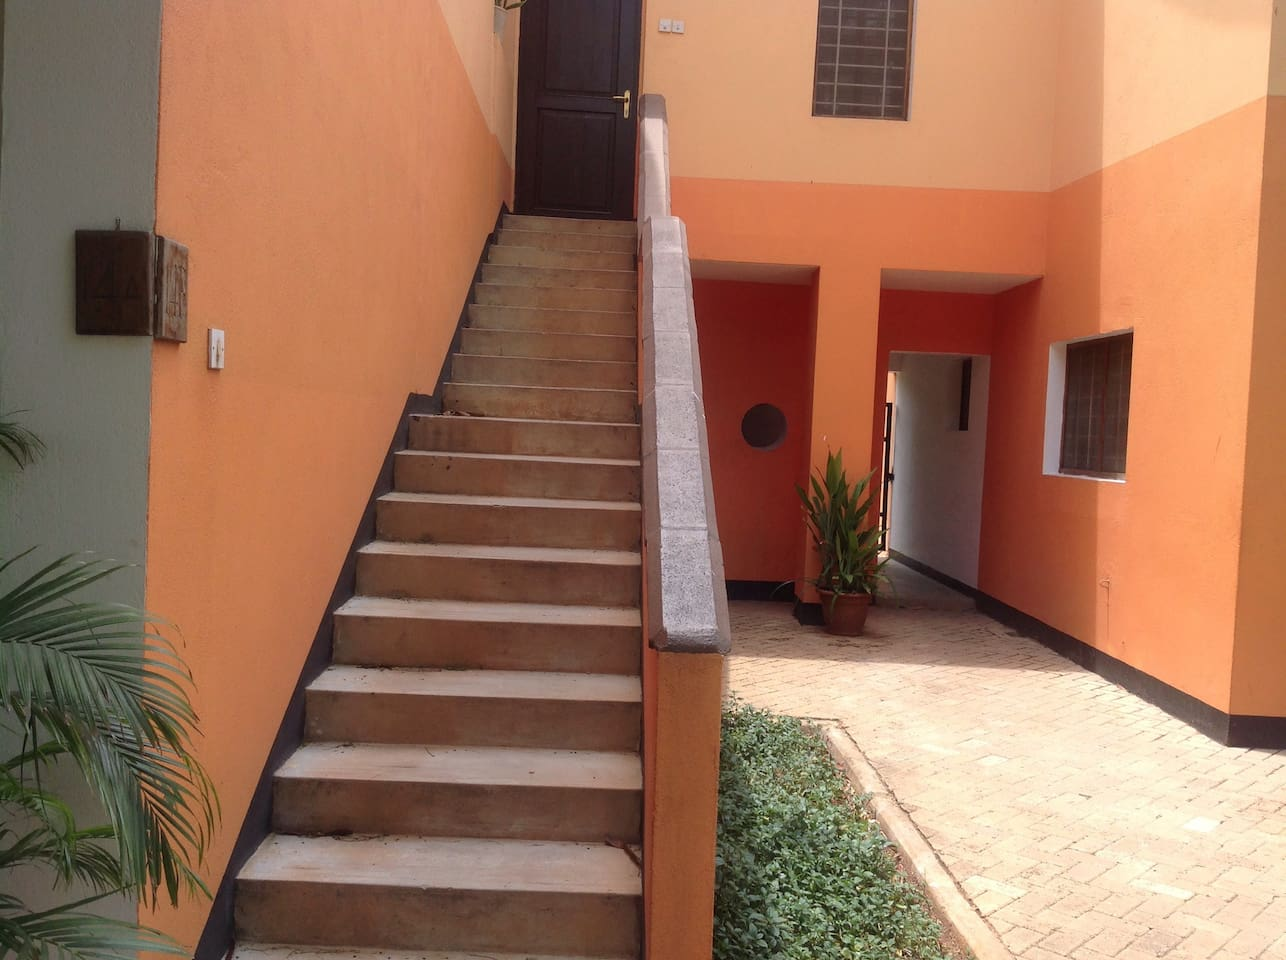 Single room apartment upstairs